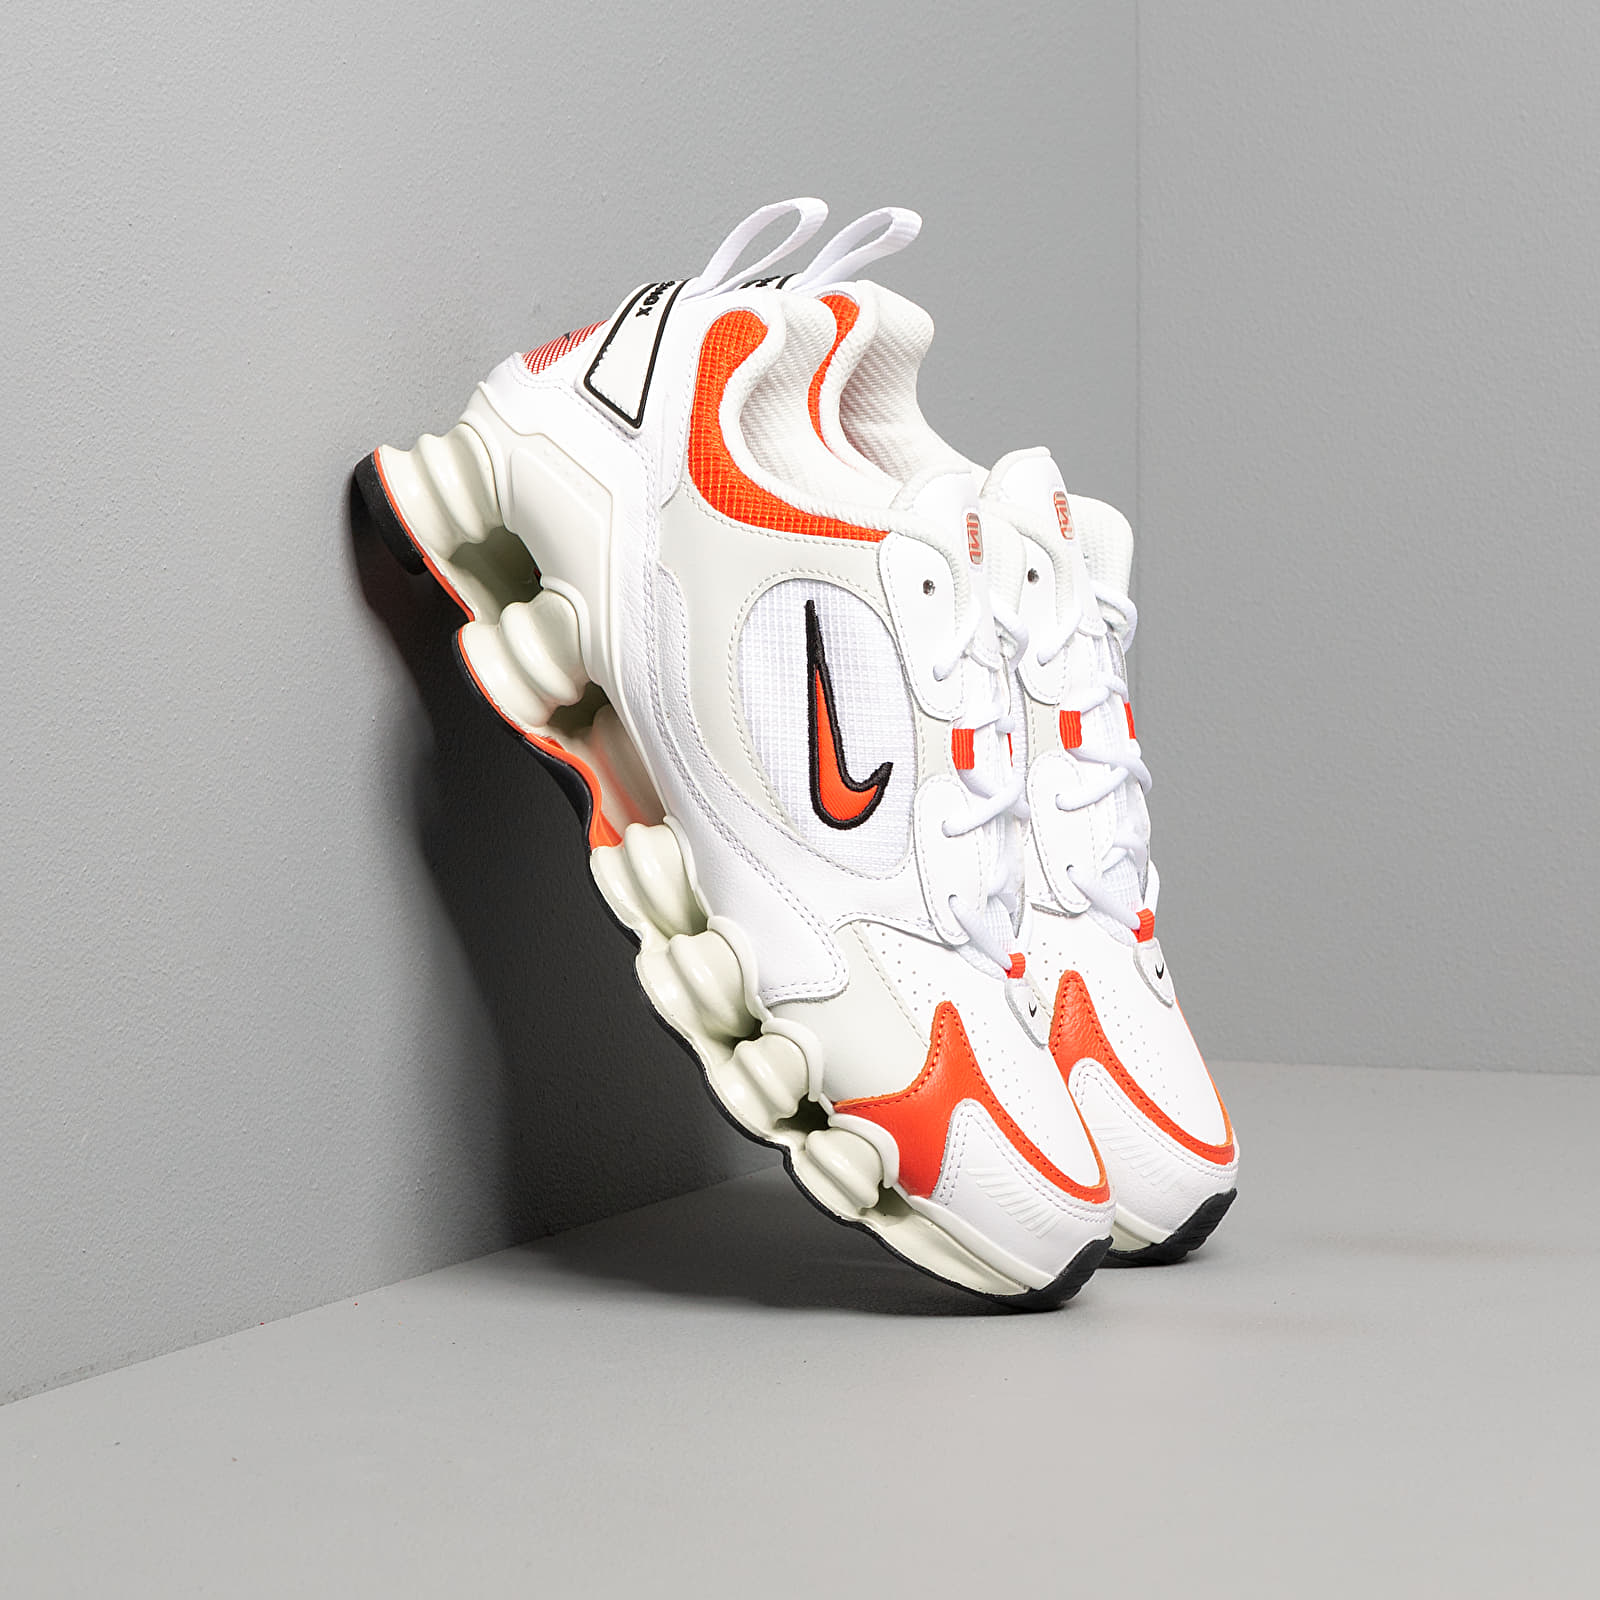 Dámské tenisky a boty Nike W Shox TL Nova White/ Team Orange-Spruce Aura-Black